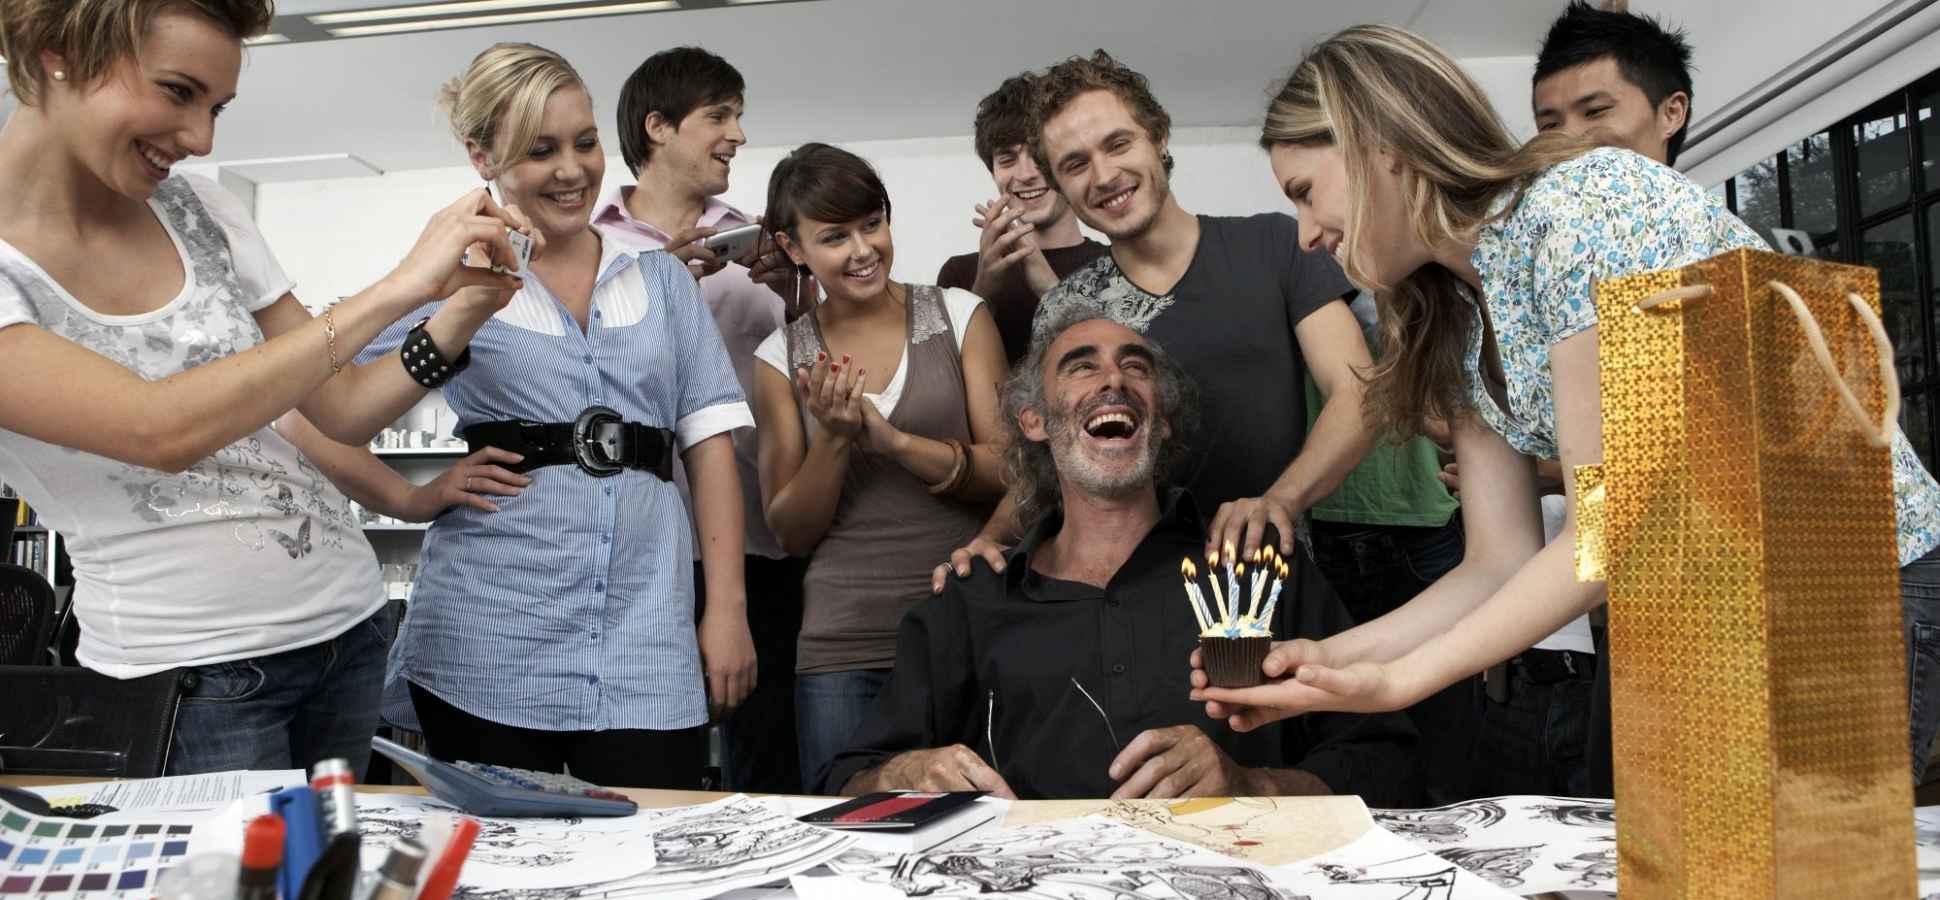 7 Reasons the Best Leaders Treat Their Employees Like Customers